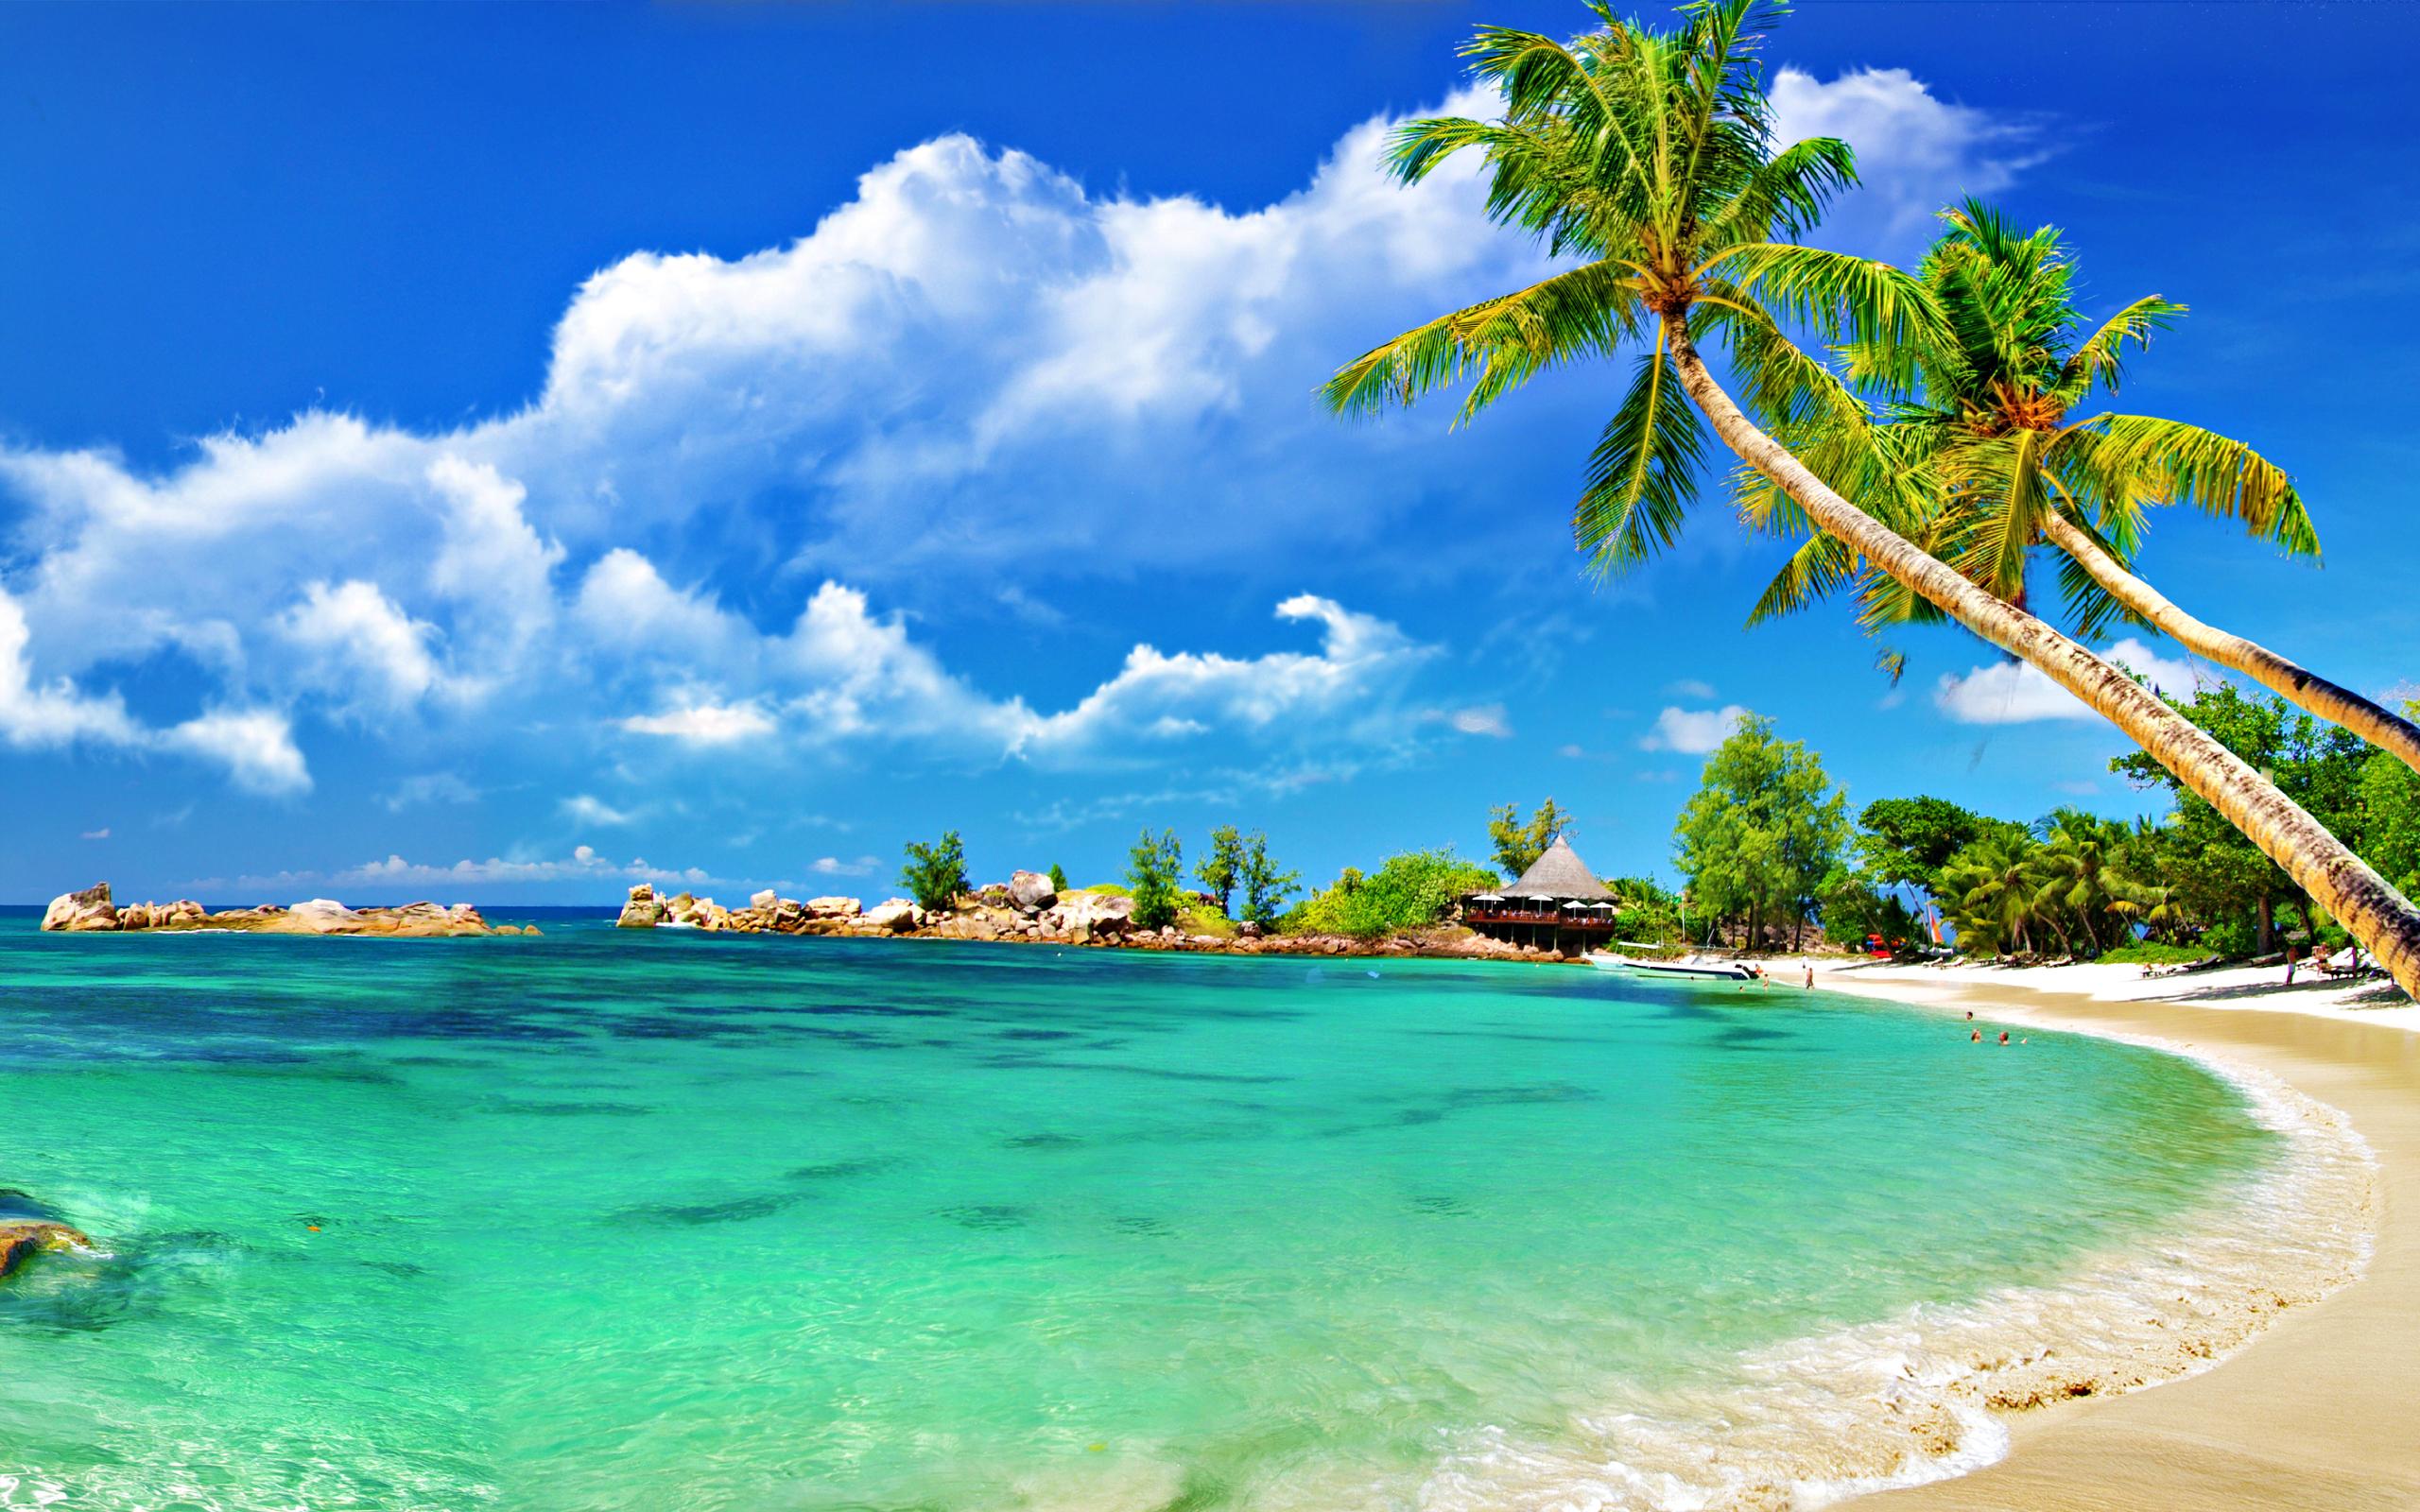 Tropical Beaches Desktop Wallpaper